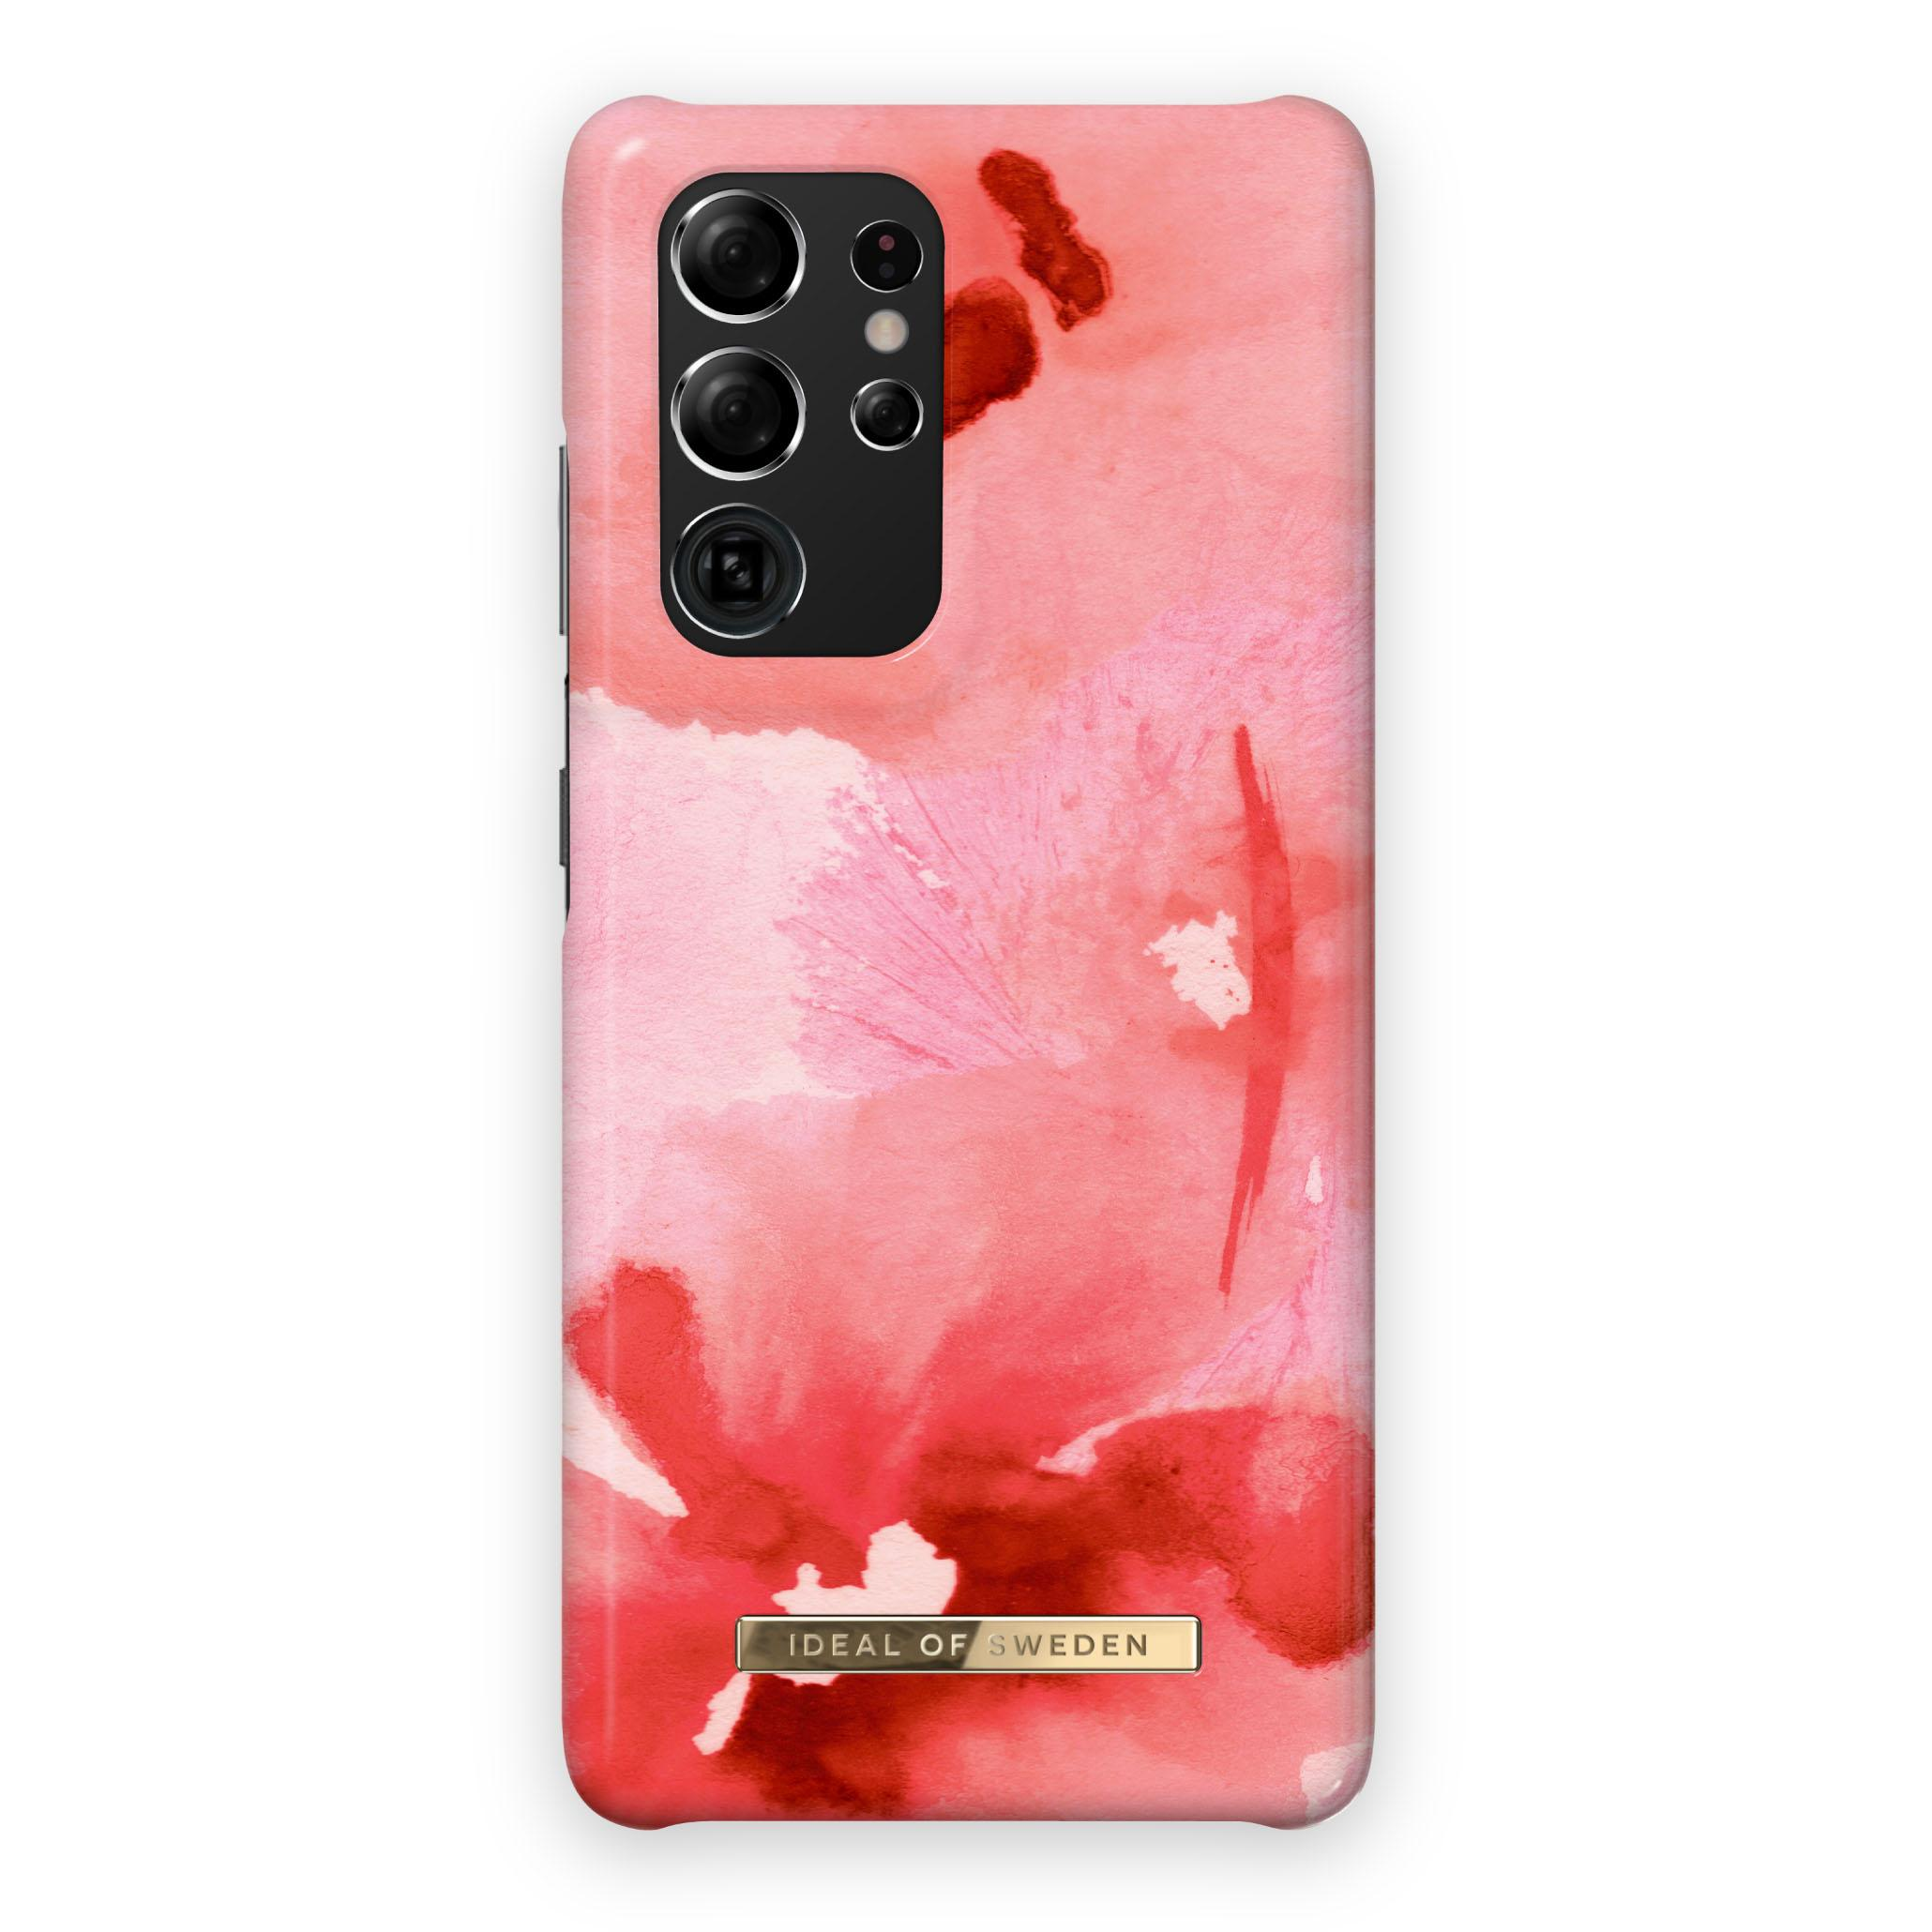 Fashion Case Galaxy S21 Ultra Coral Blush Floral